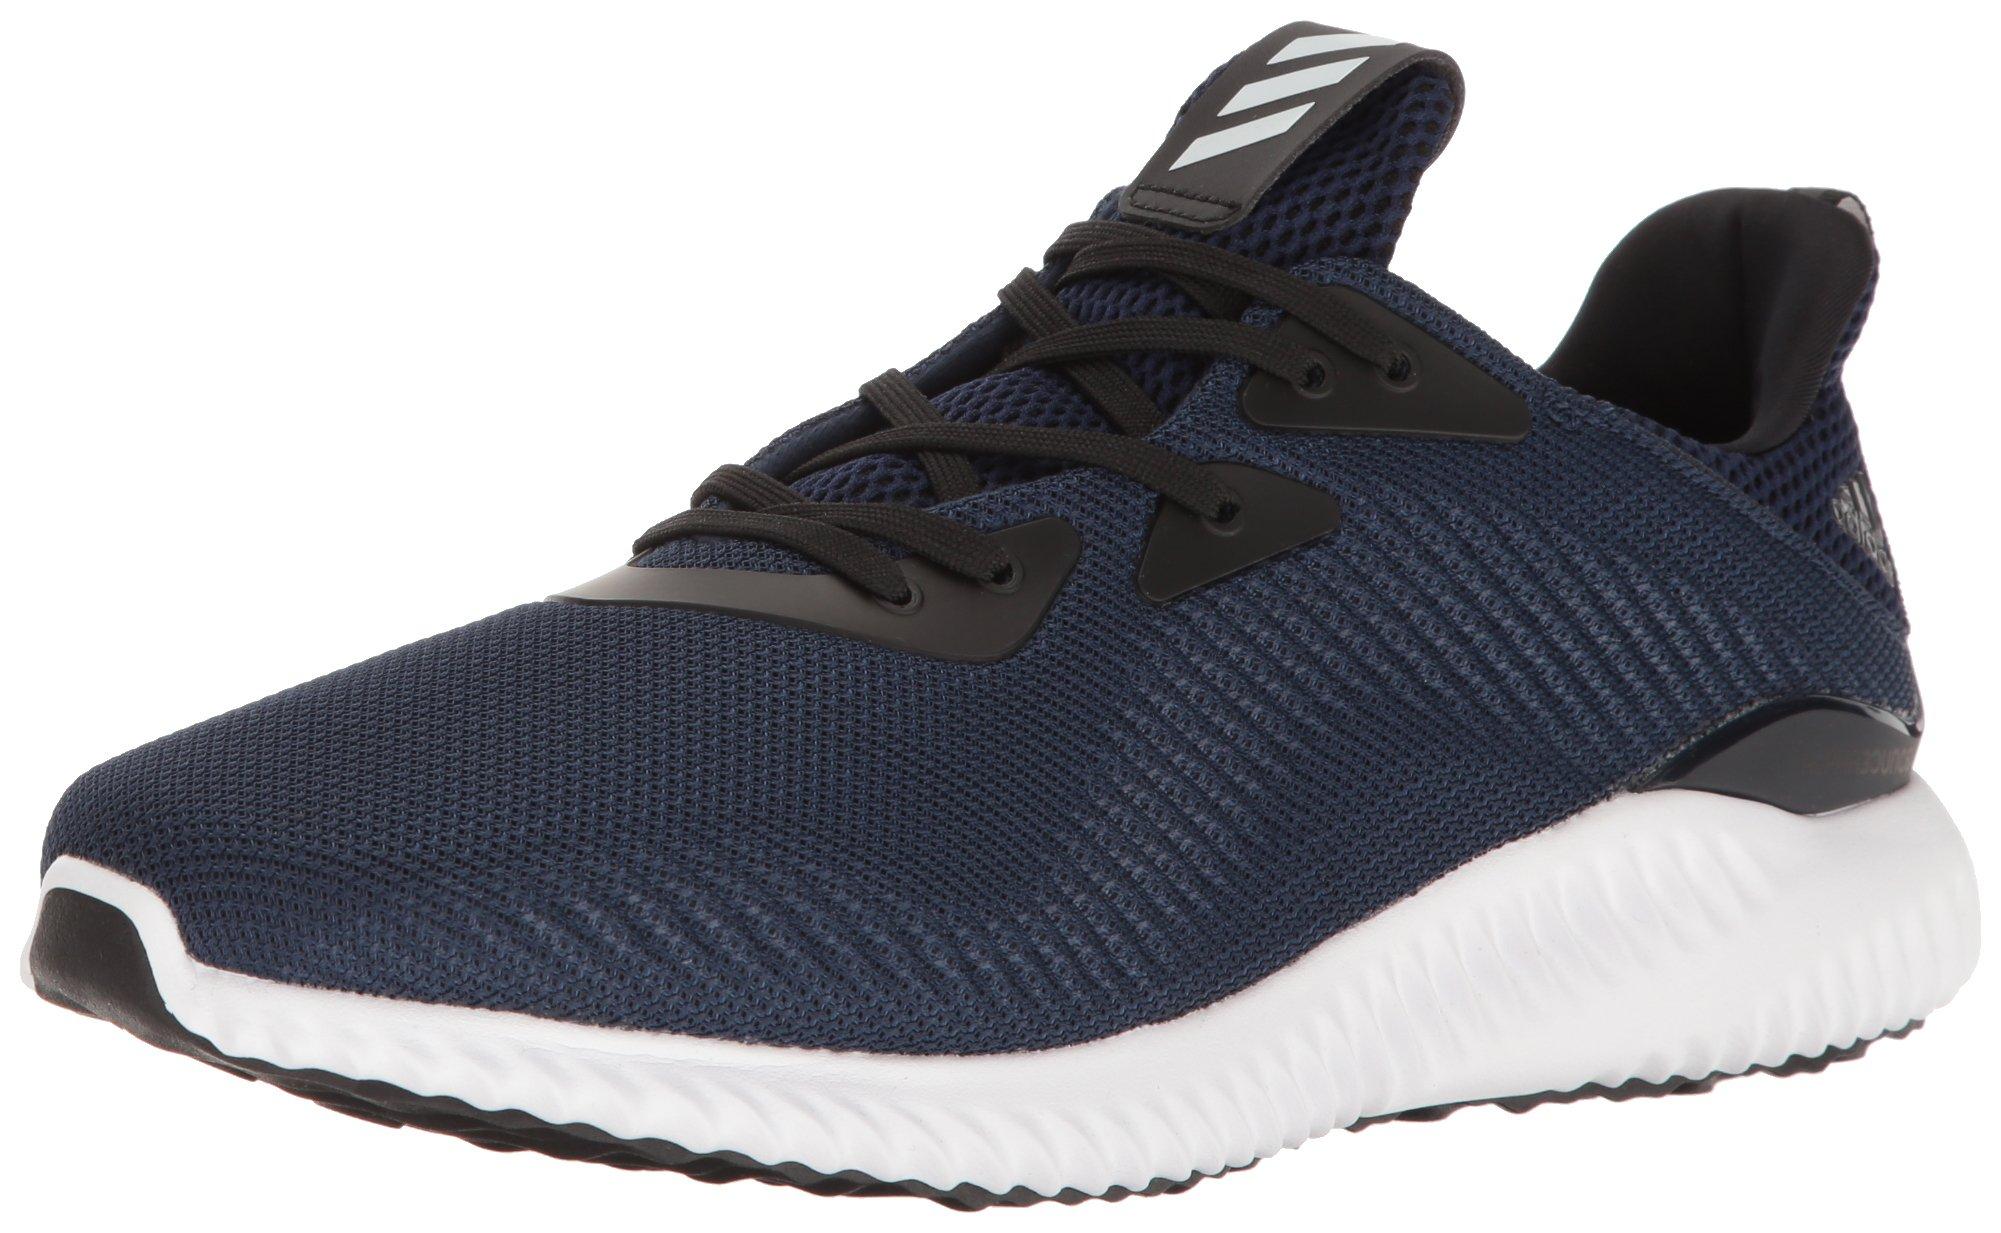 adidas Performance Men's Alphabounce 1 M Running Shoe, Collegiate Navy/White/Black, 7.5 M US